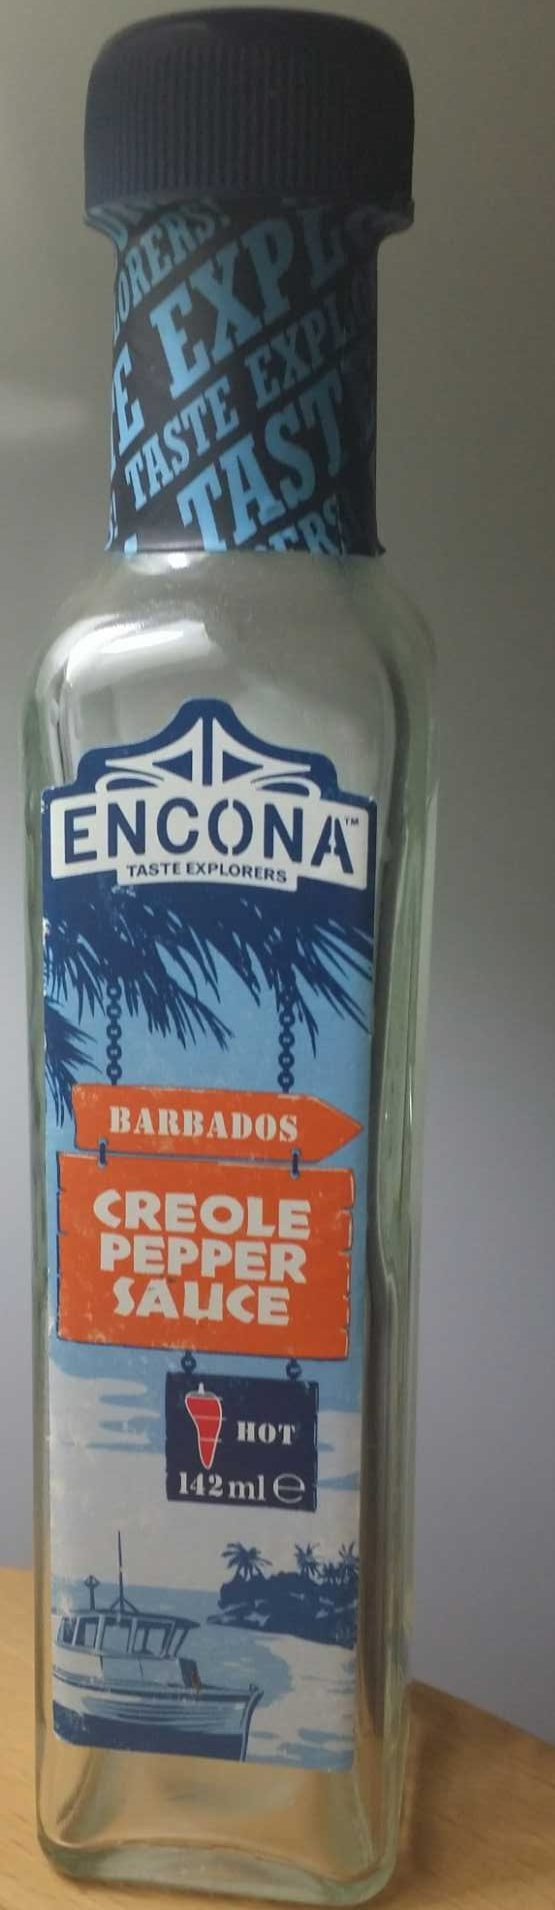 Barbados Créole Pepper Sauce - Product